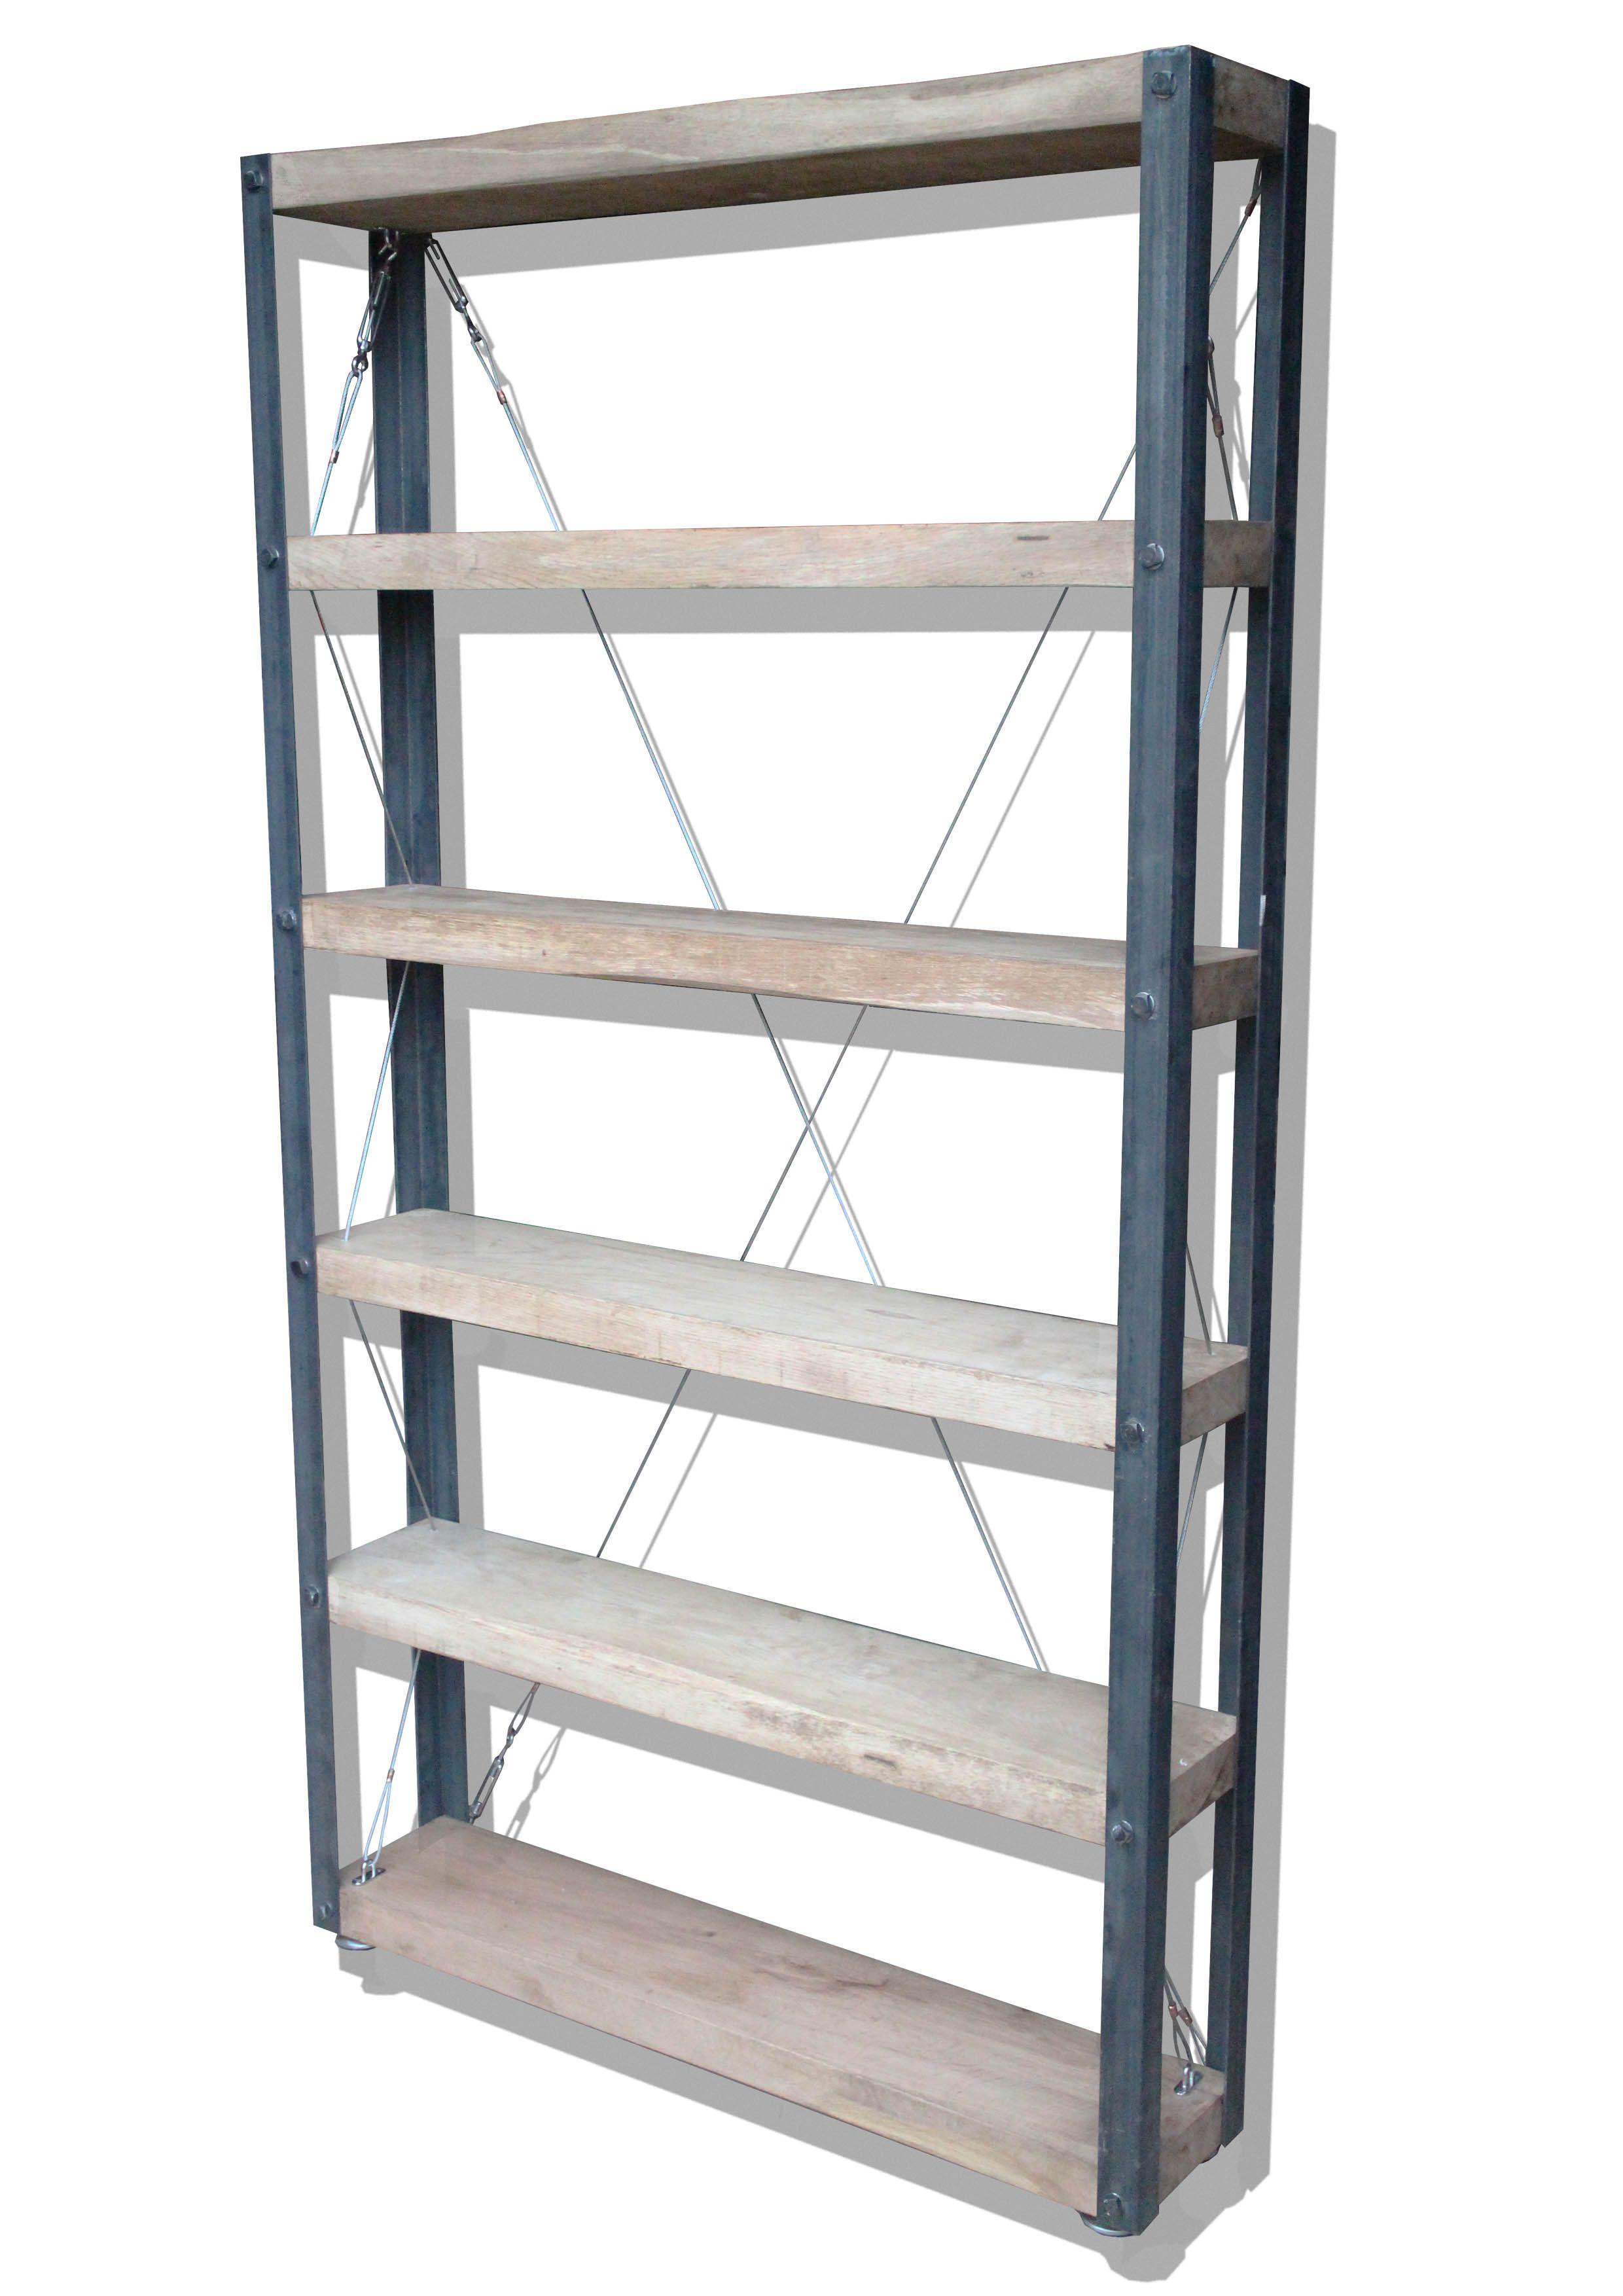 Classic' INDUSTRIAL Bookcase [180cm X 100cm] | Industrial, Coach